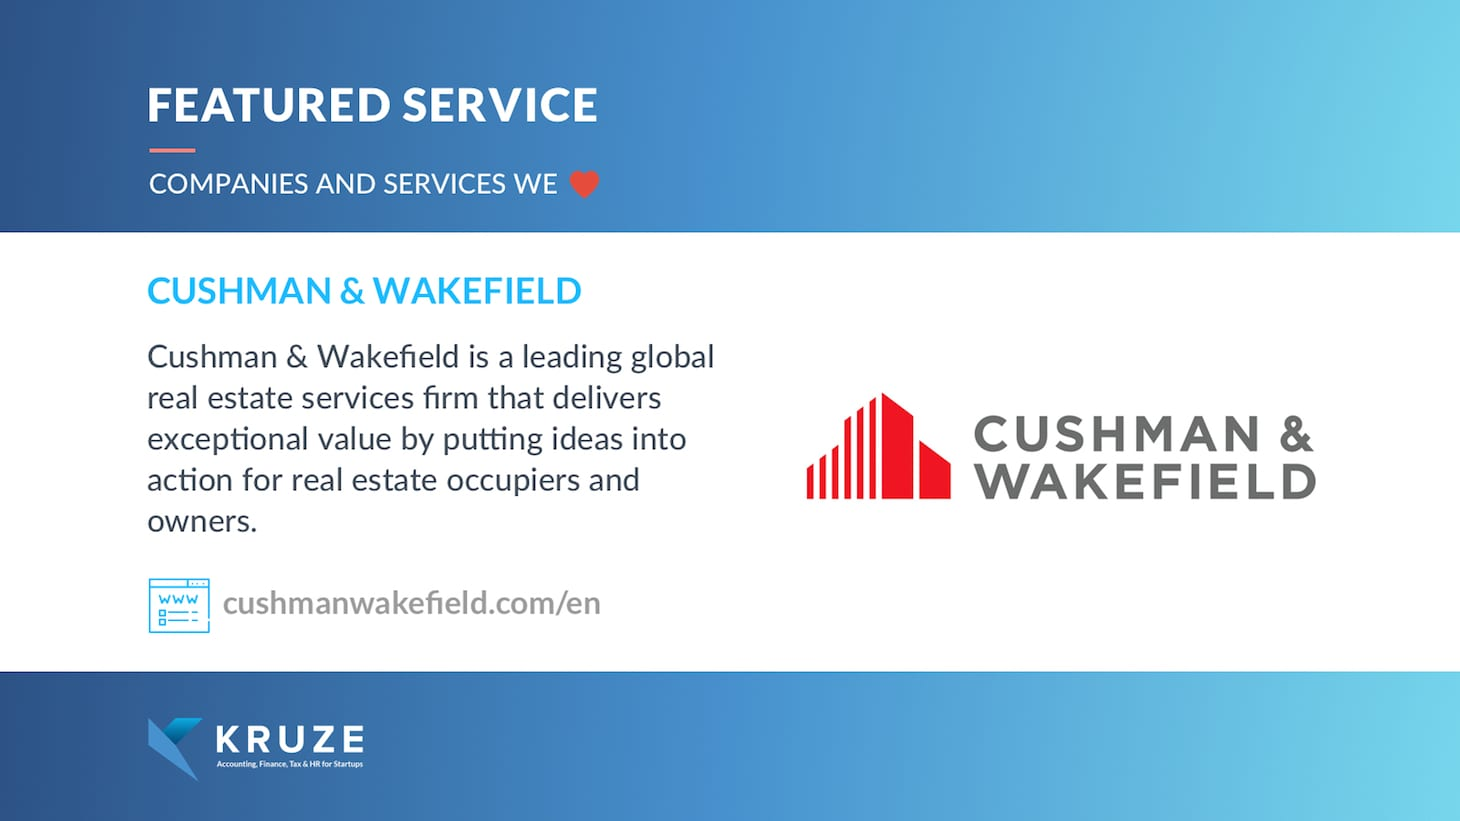 Featured Service - Cushman & Wakefield